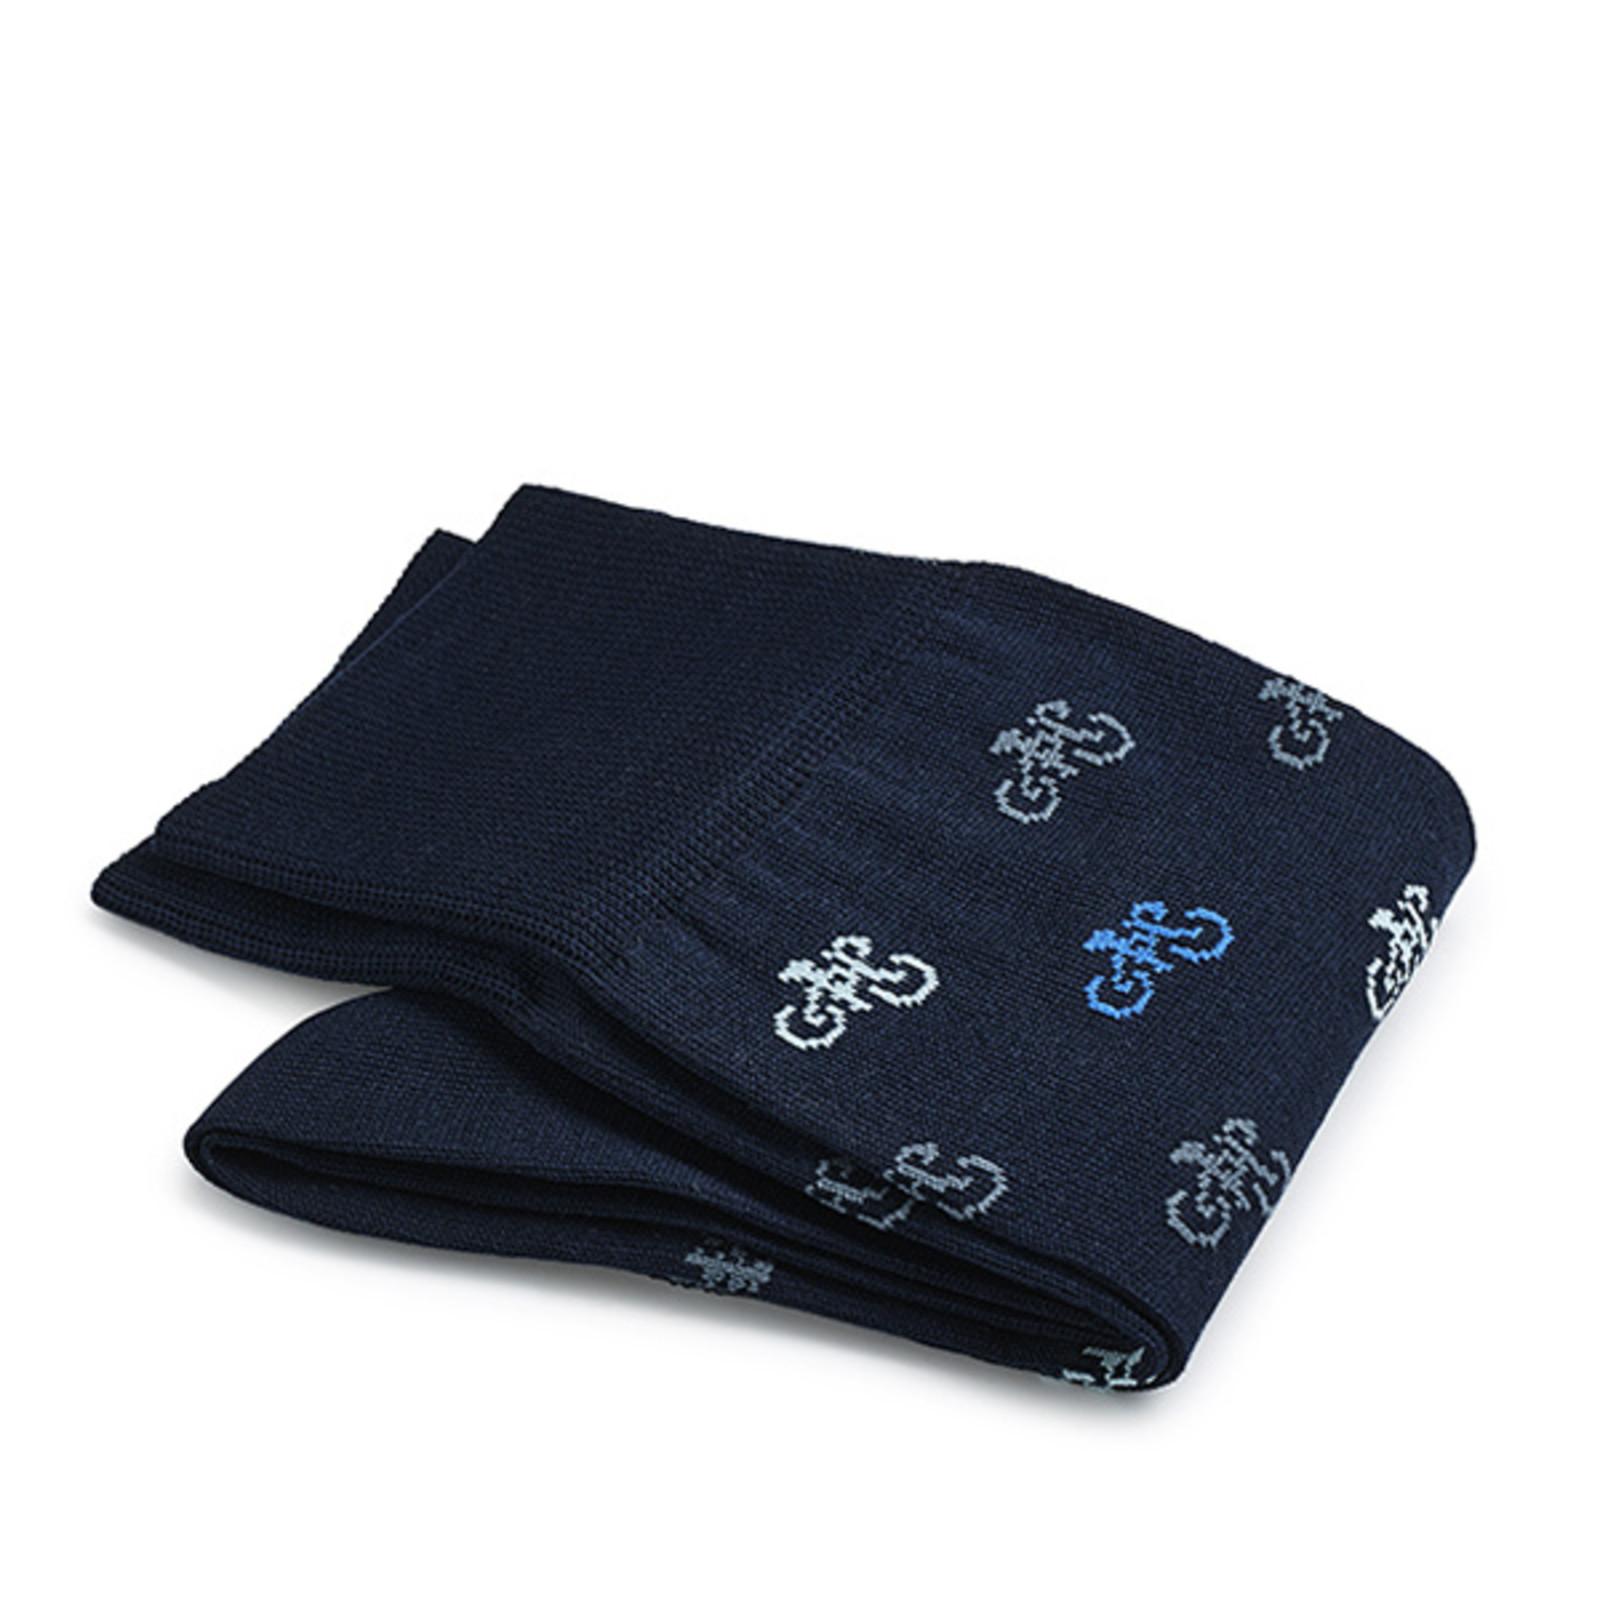 Carlo Lanza Darkblue Italian bike socks